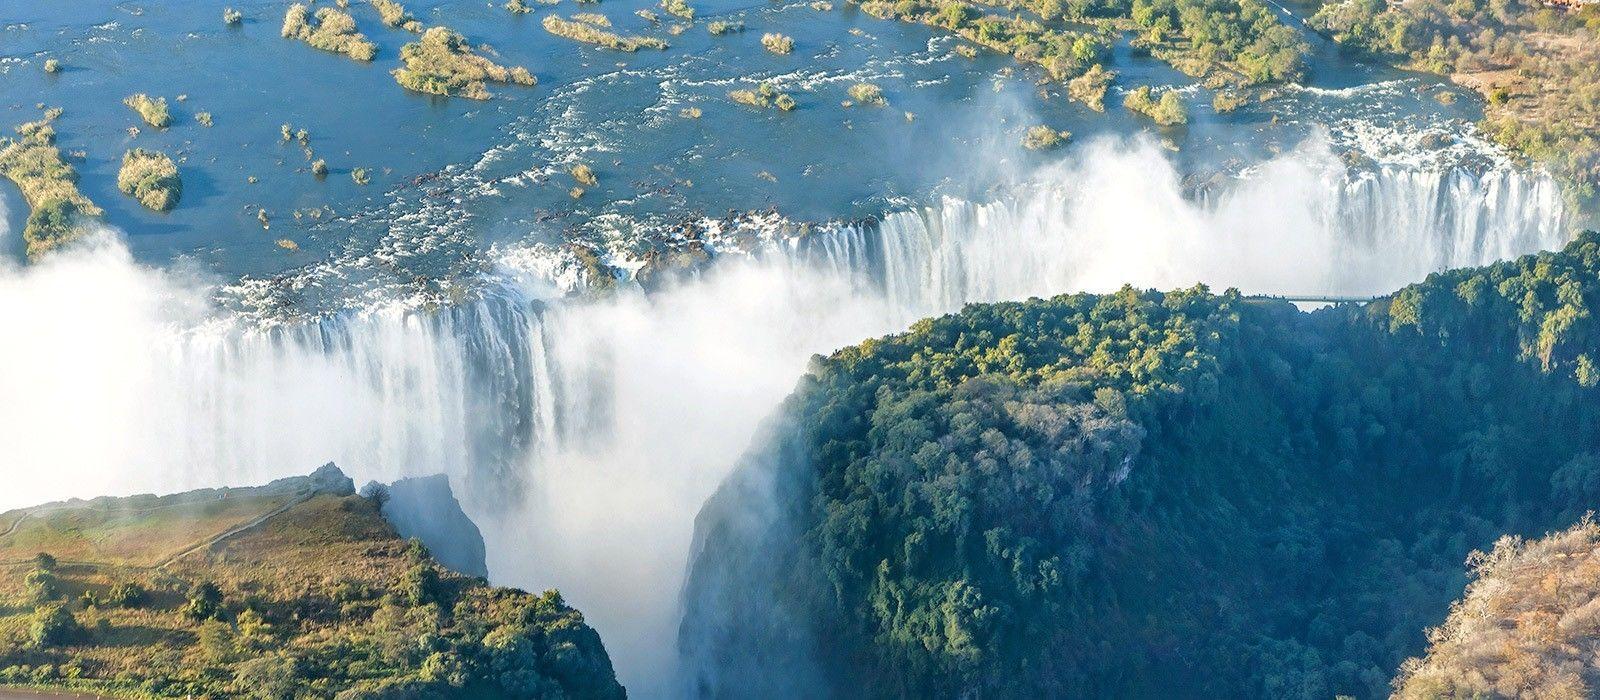 Classic Namibia and Botswana Overland Tour Trip 6